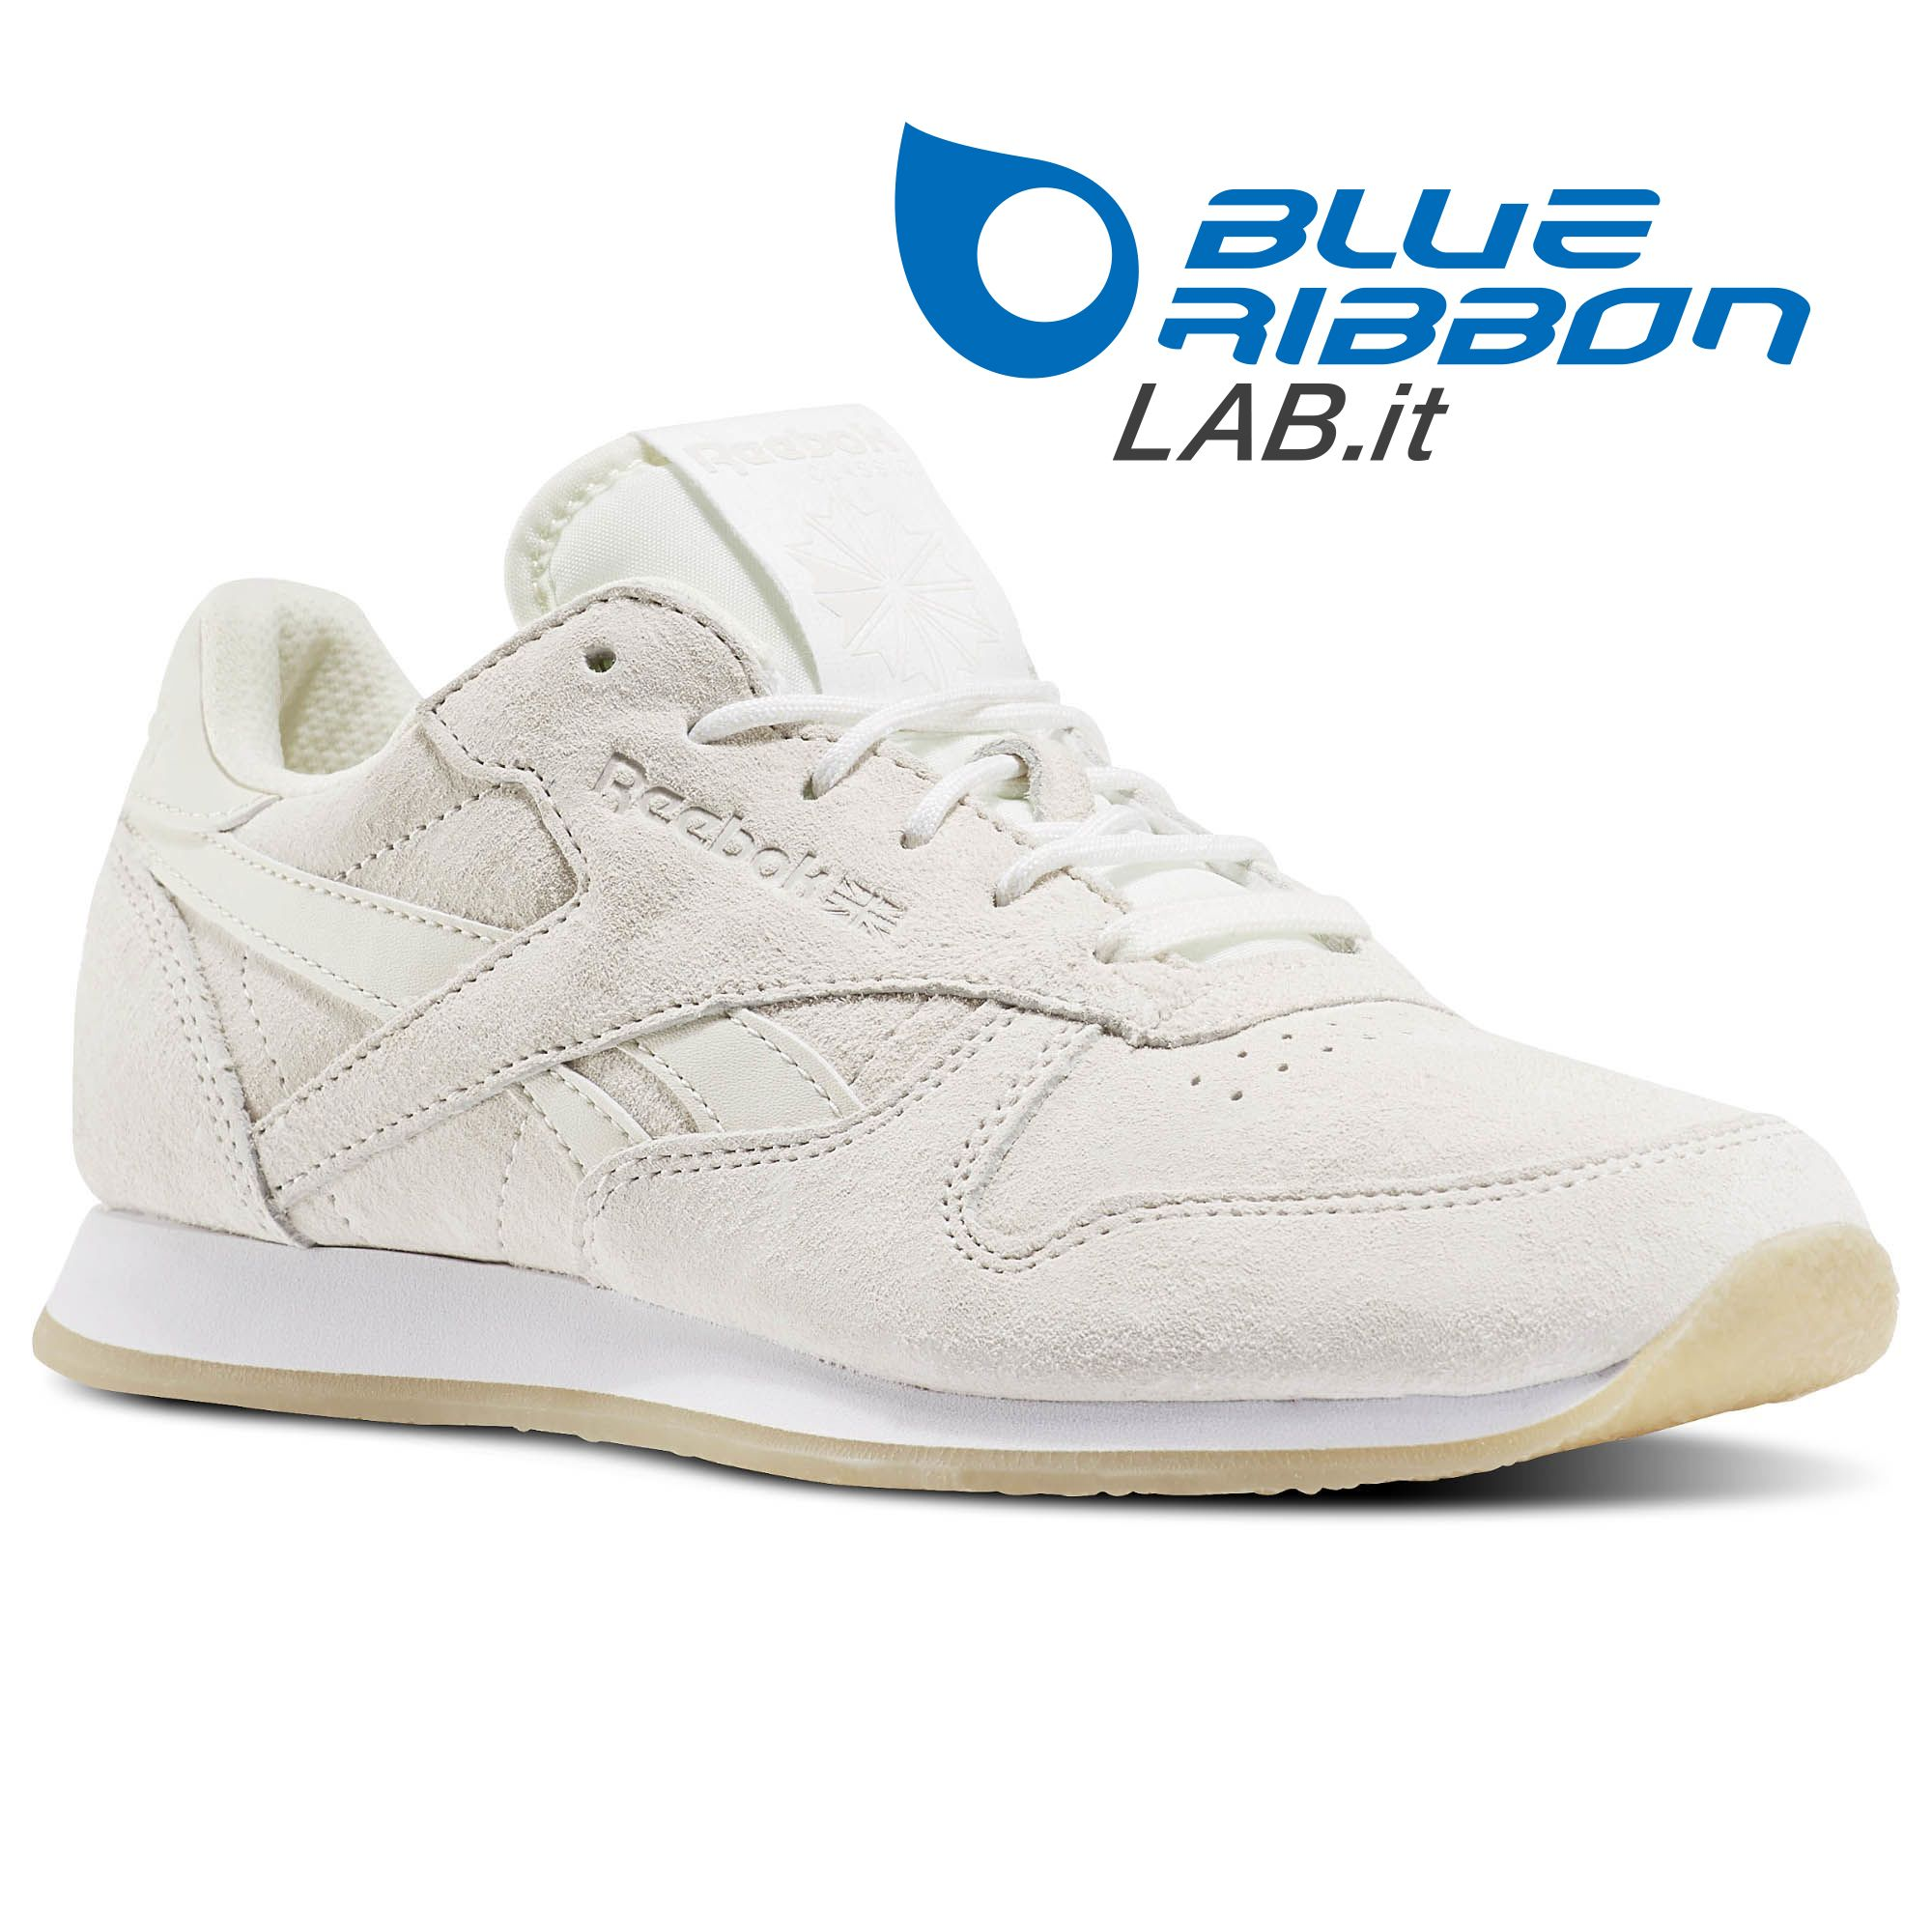 BlueRibbonLab: Reebok Sneakers LO - CLASSIC LEATHER CREPE SAIL AWAY - BD3017